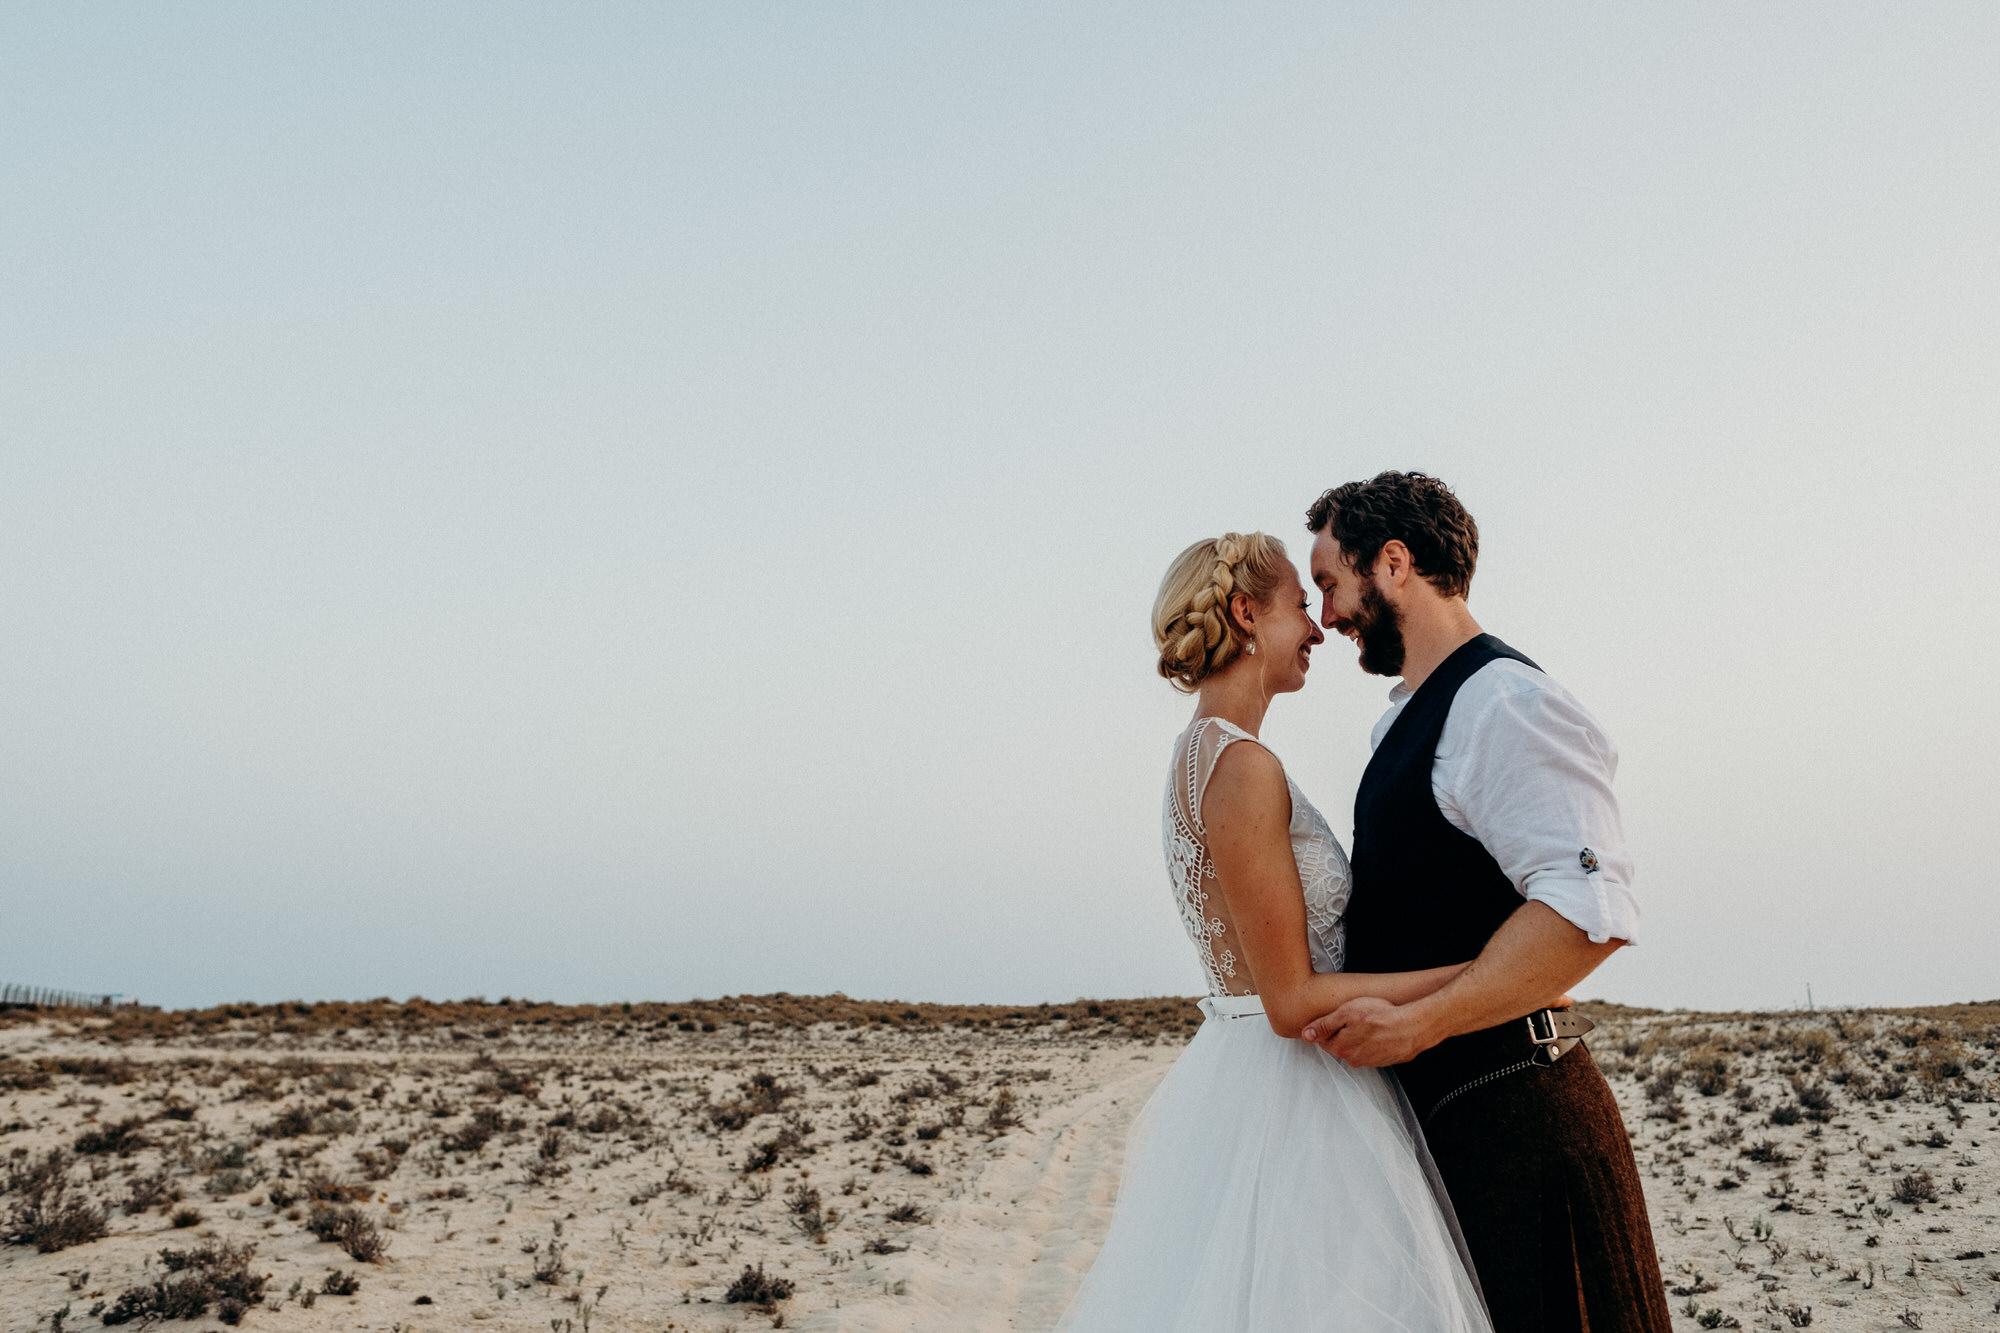 025-Leigh-Chris-Portugal-Wedding.jpg